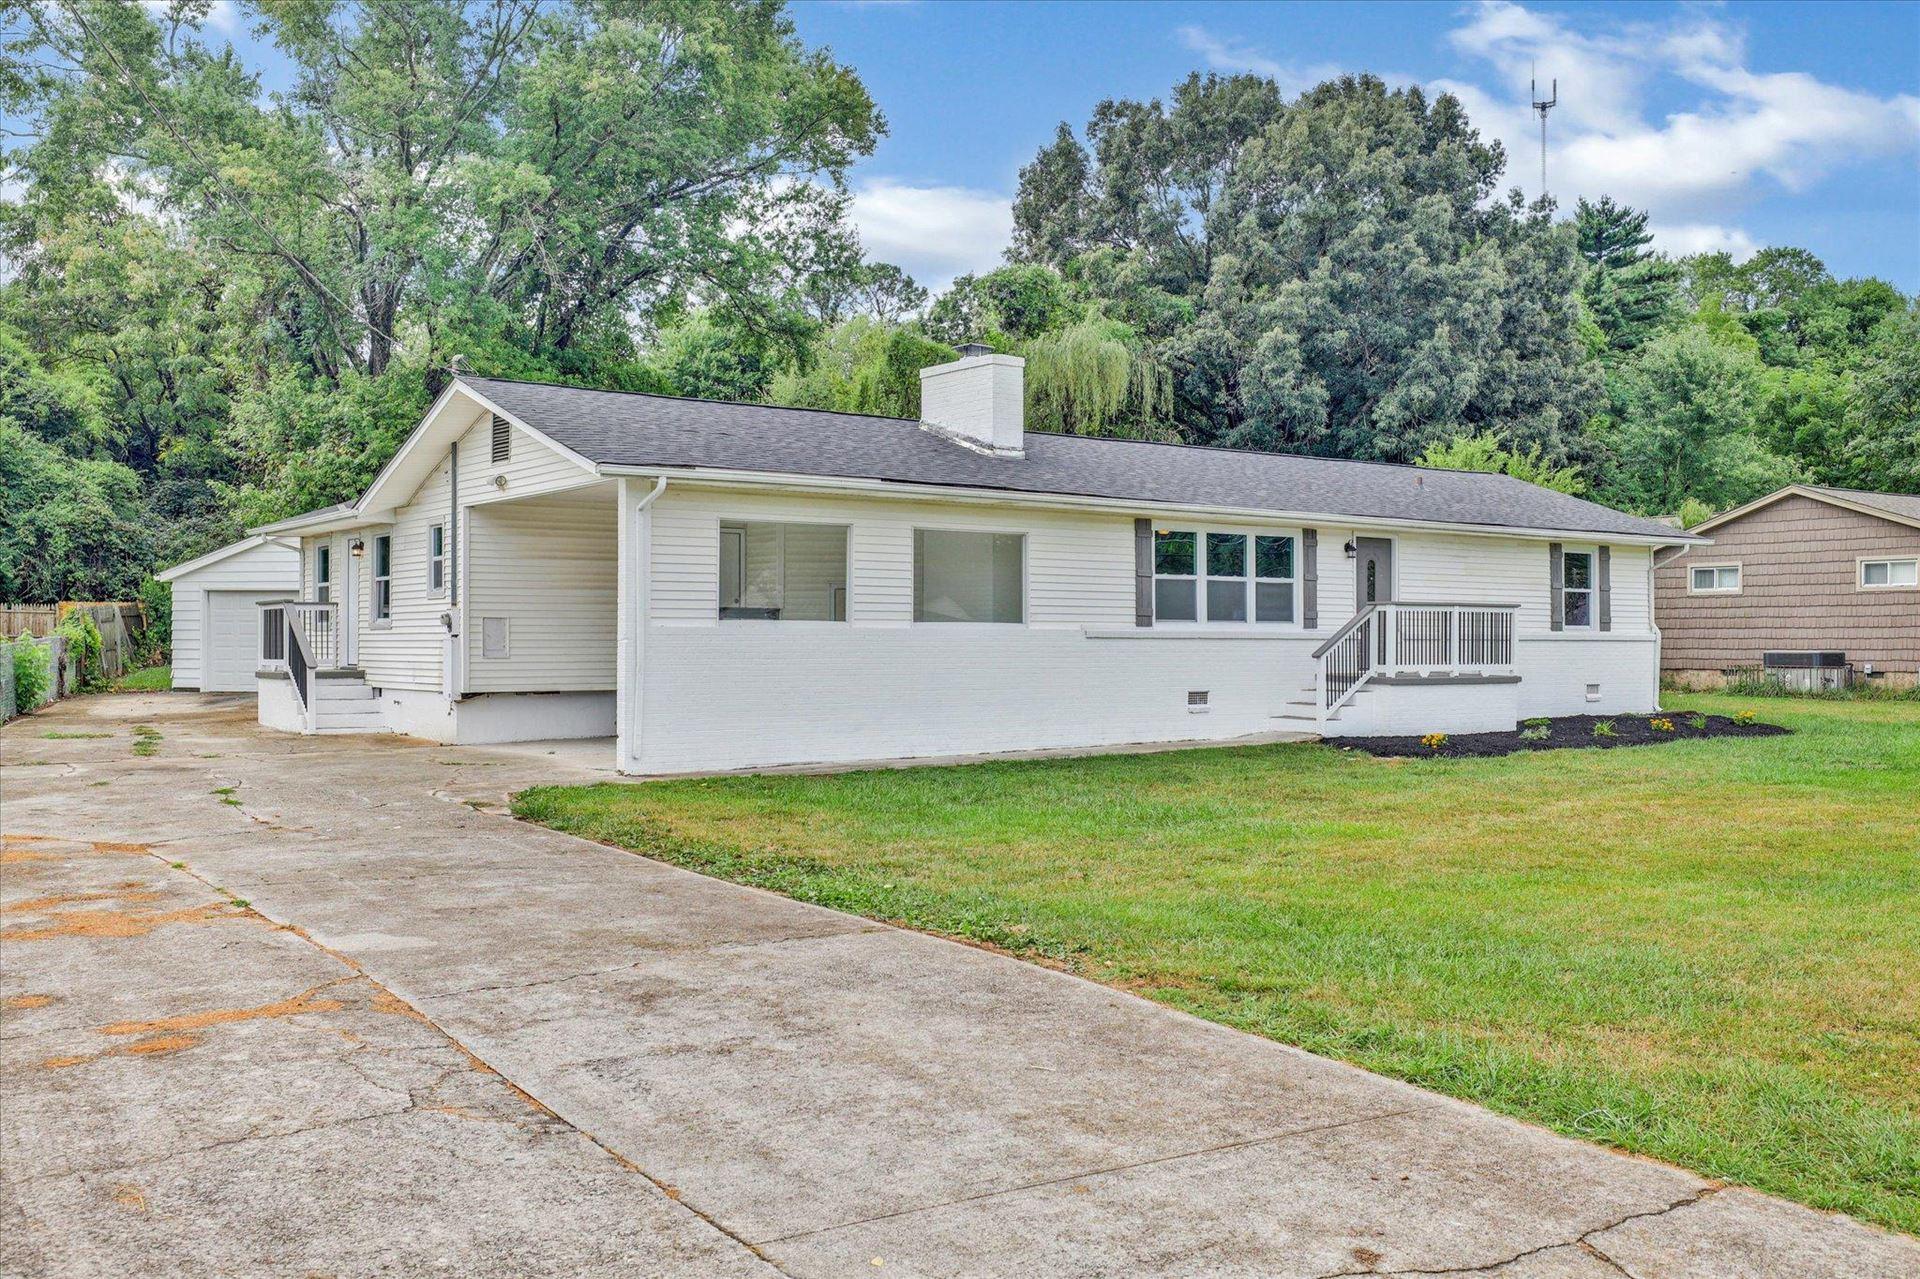 716 Glenoaks Drive, Knoxville, TN 37912 - MLS#: 1164751